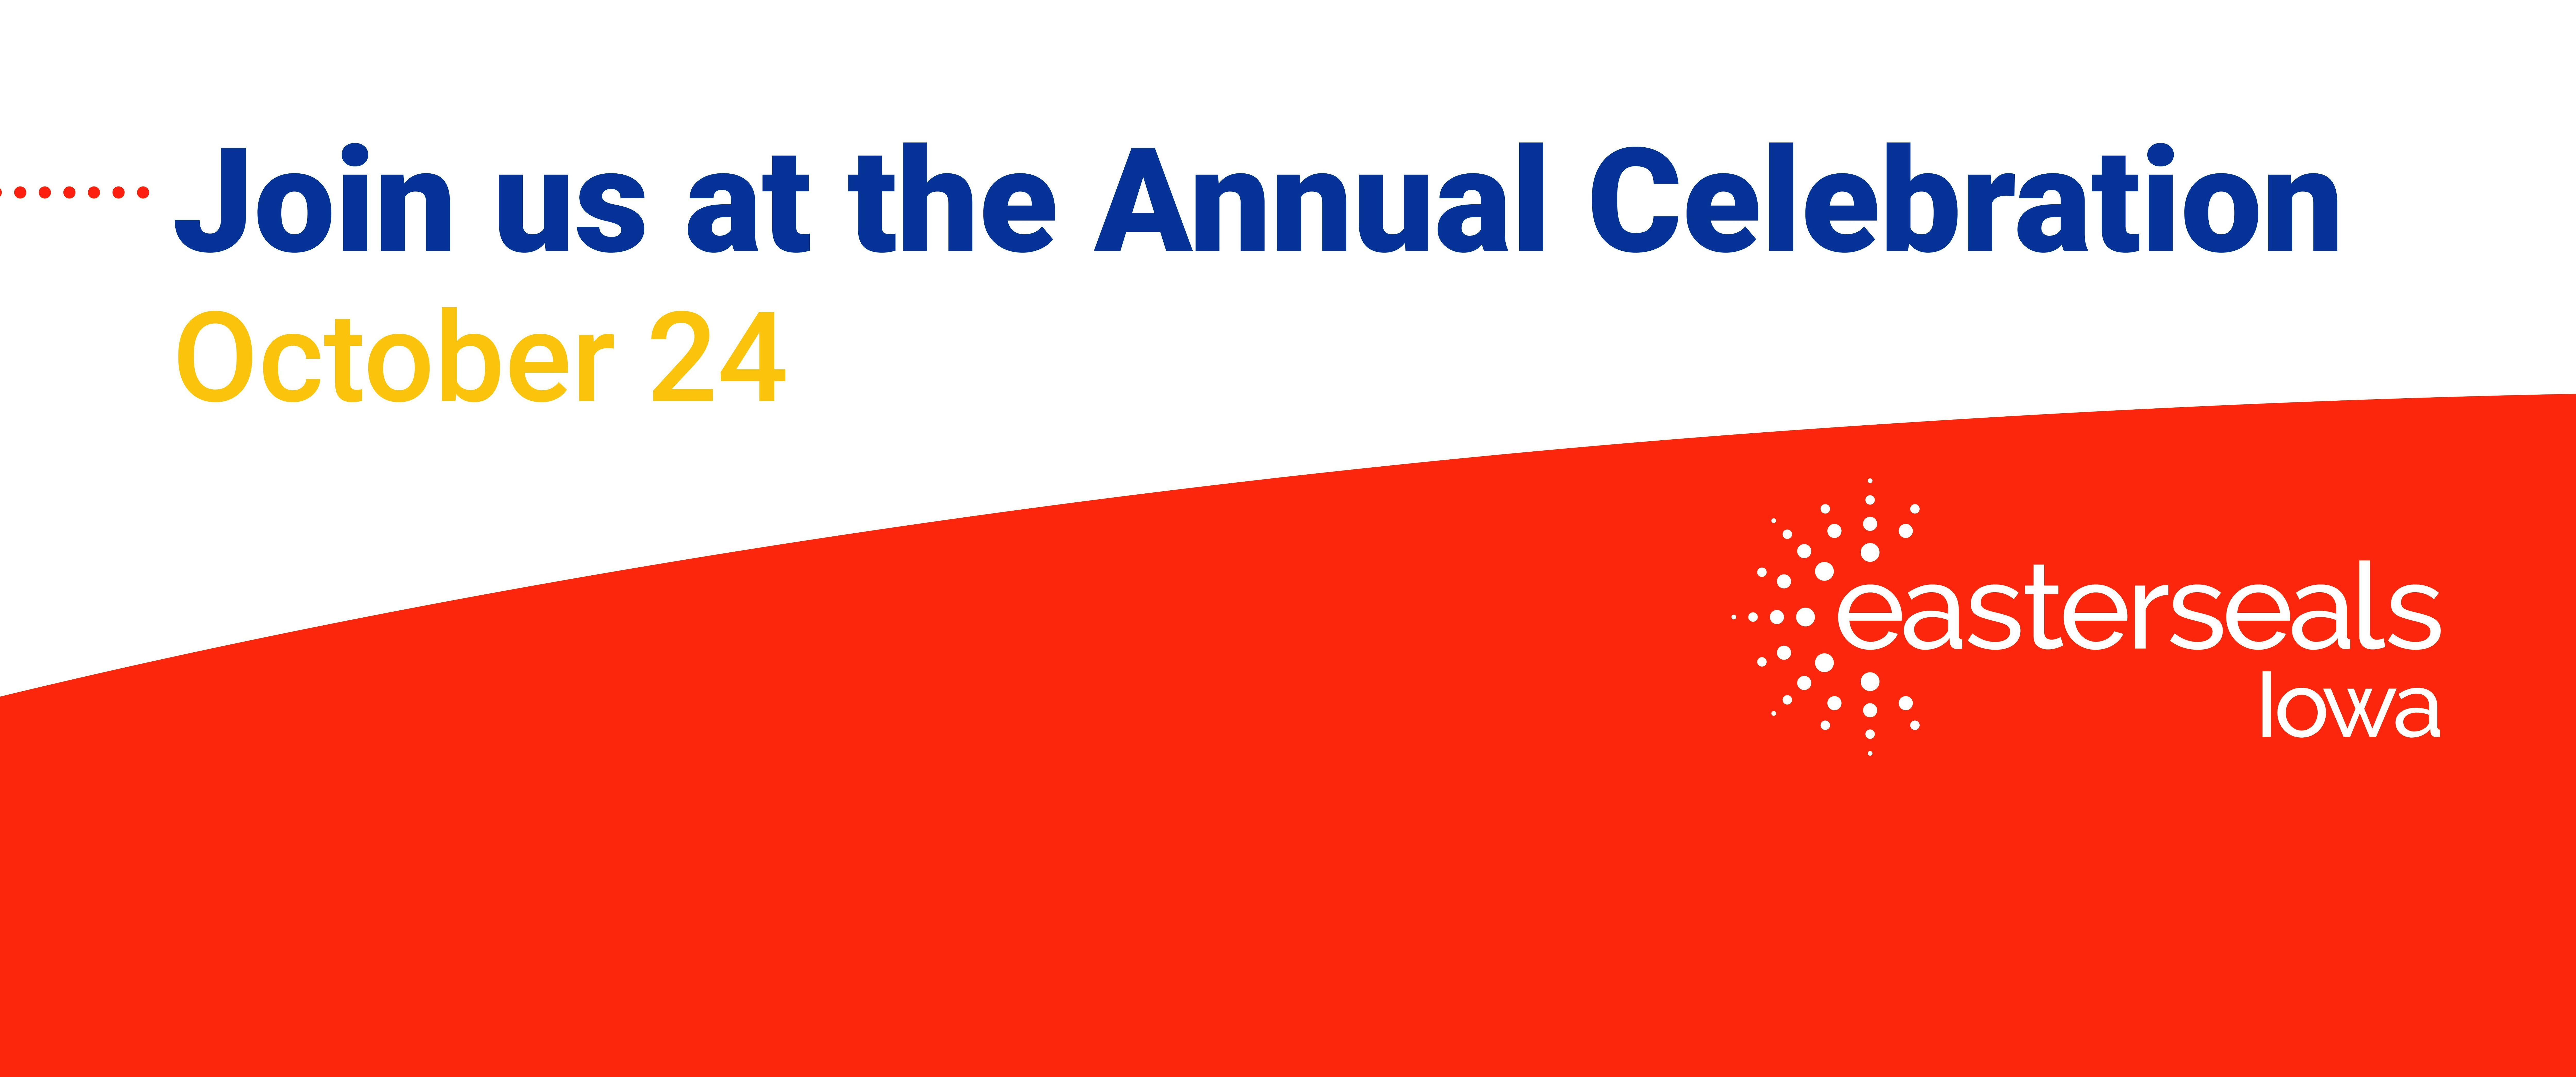 annual celebration oct 24